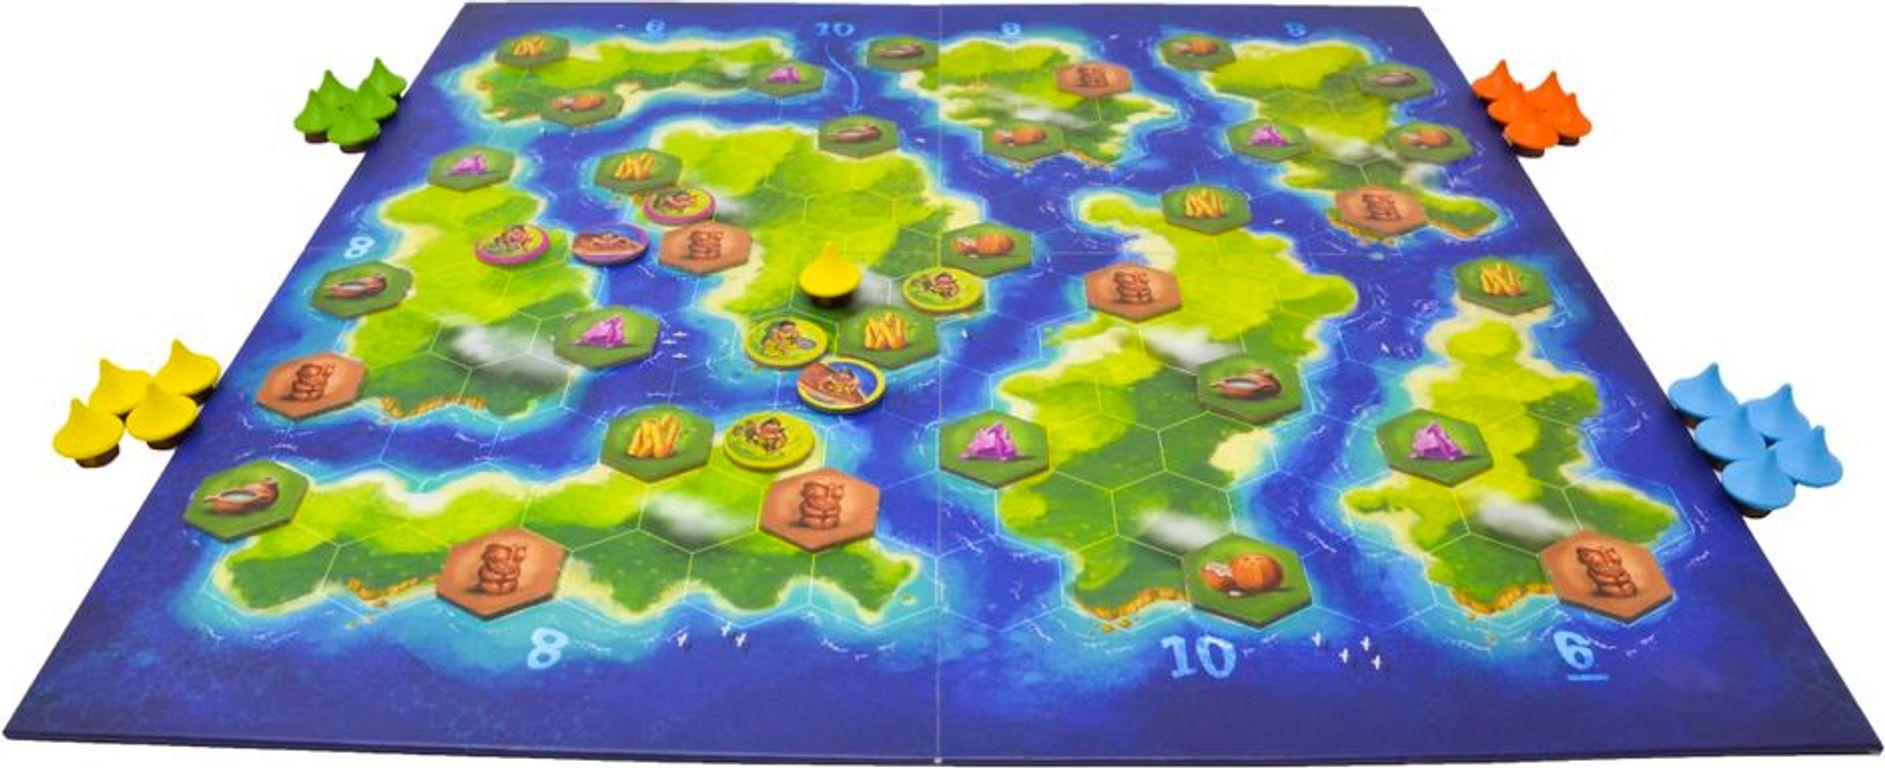 Blue Lagoon gameplay